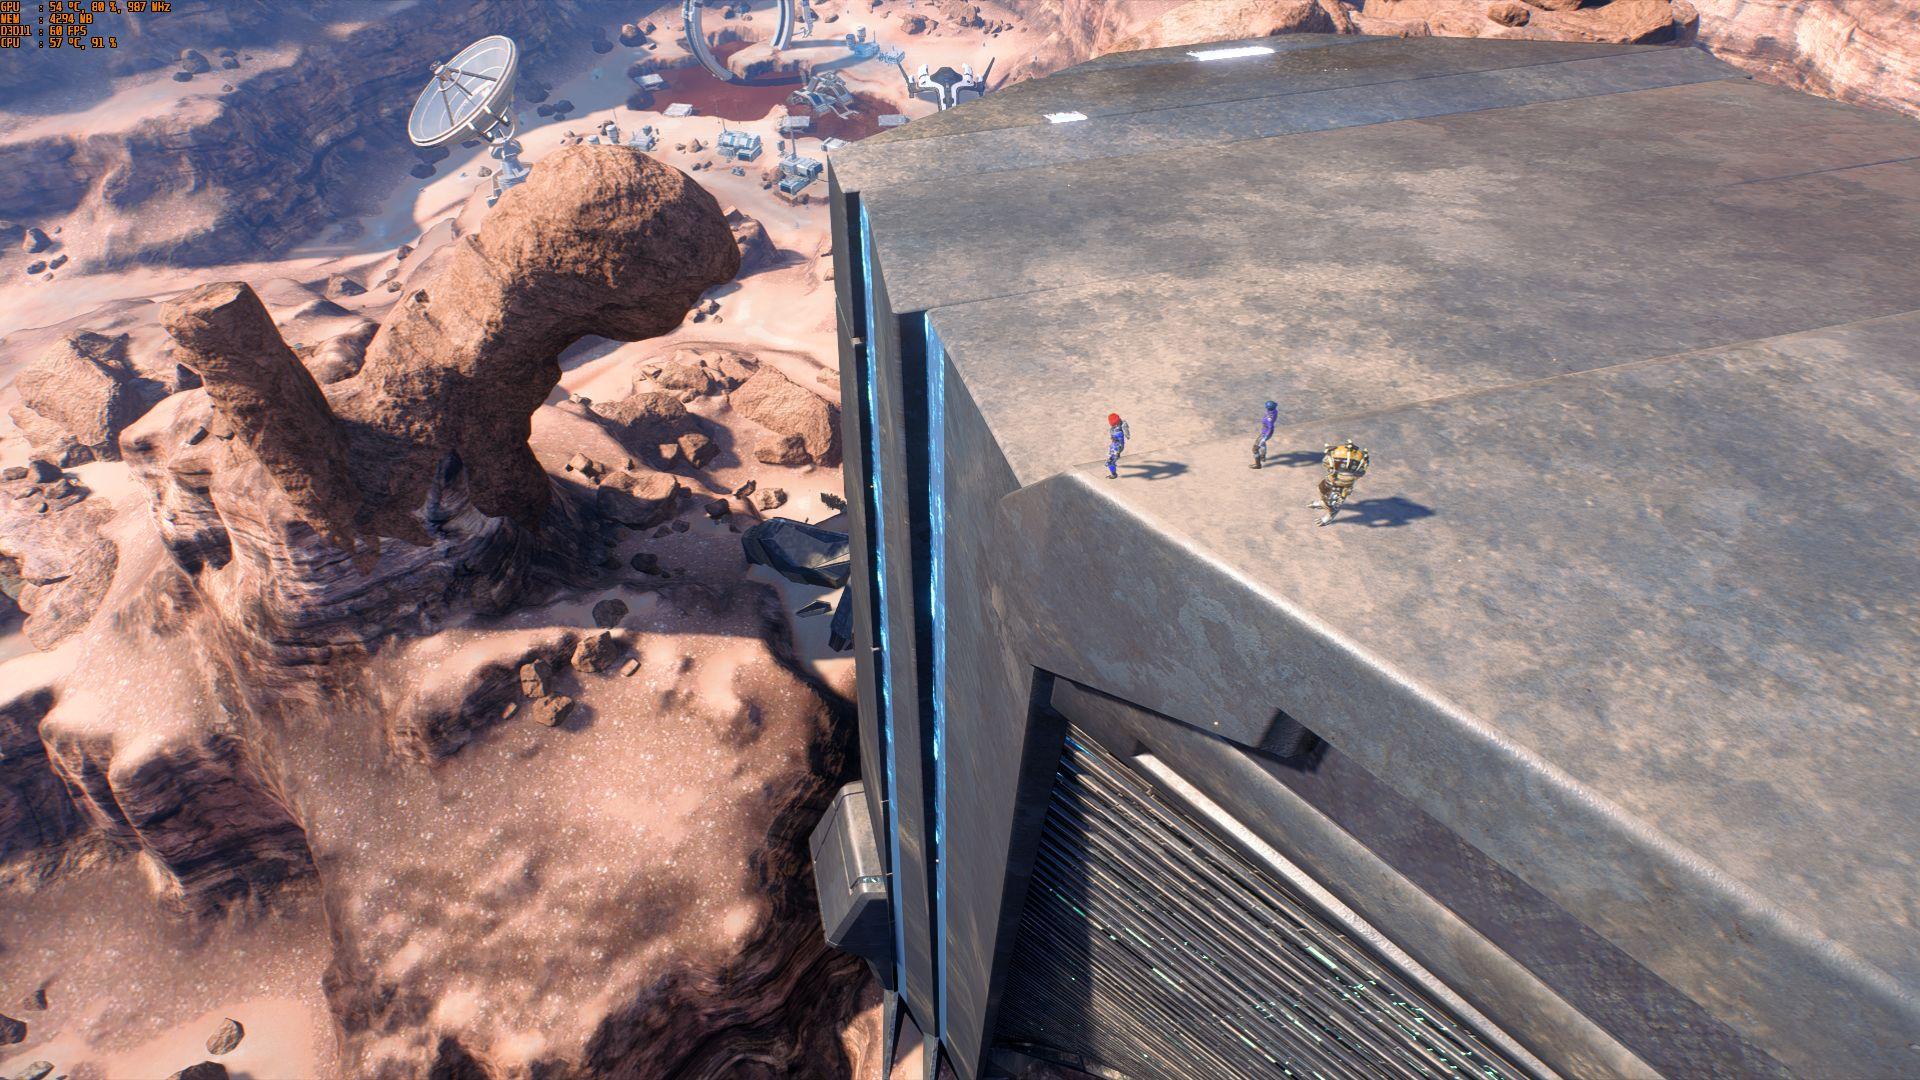 Mass Effect Andromeda Screenshot 2017.07.11 - 20.01.22.06.jpg - Mass Effect: Andromeda